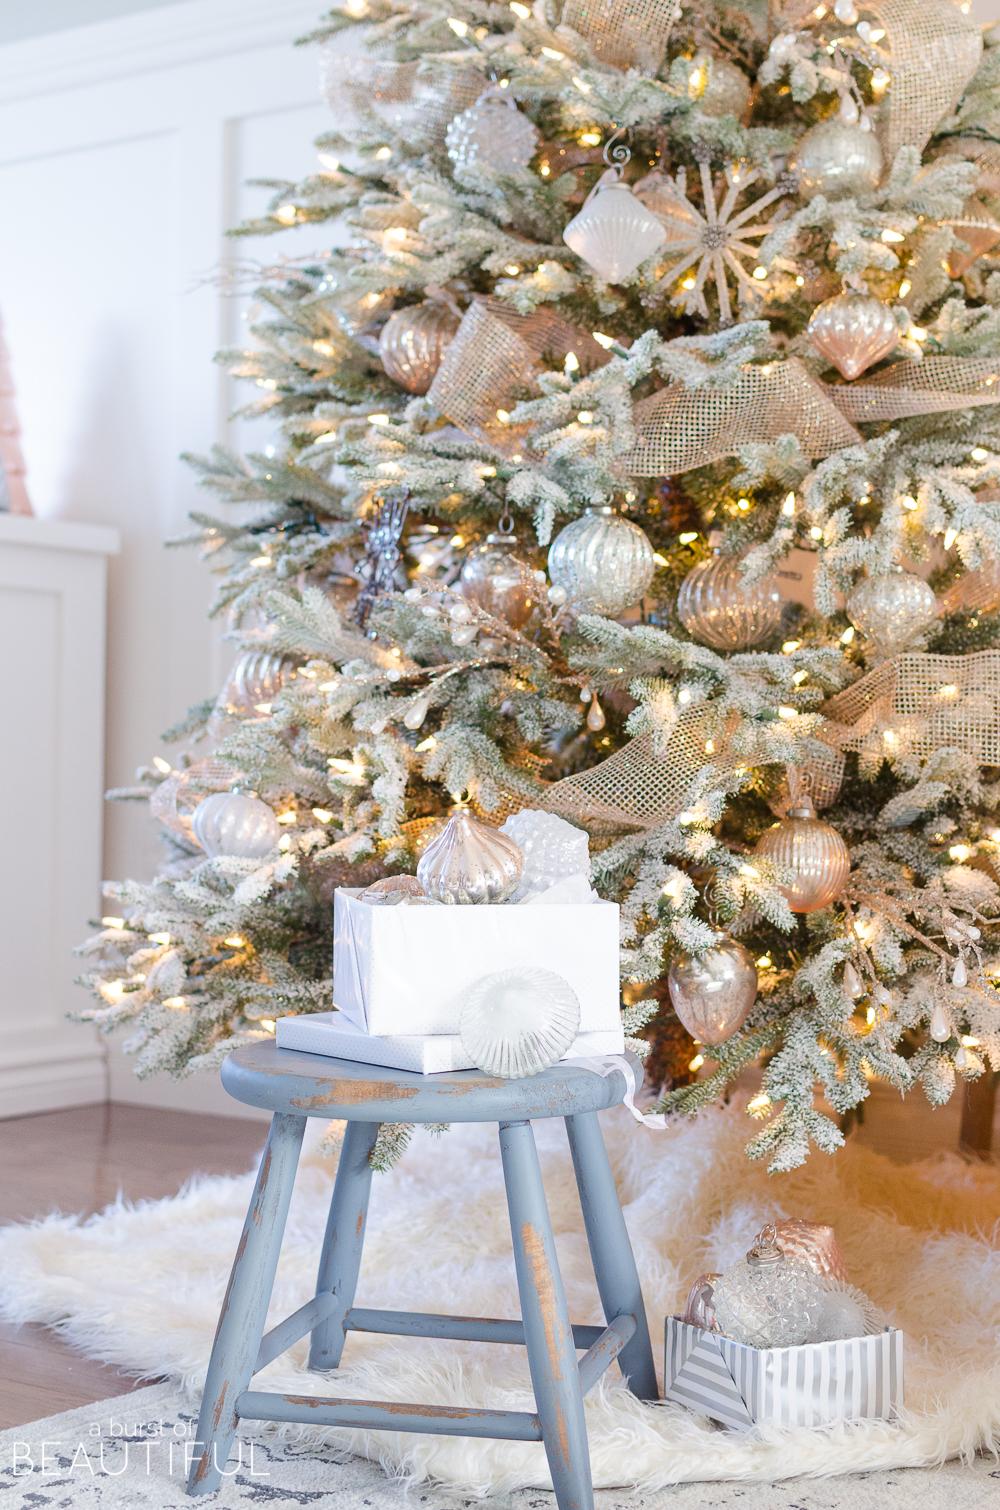 A-Snowy-Flocked-Christmas-Tree-4954.jpg